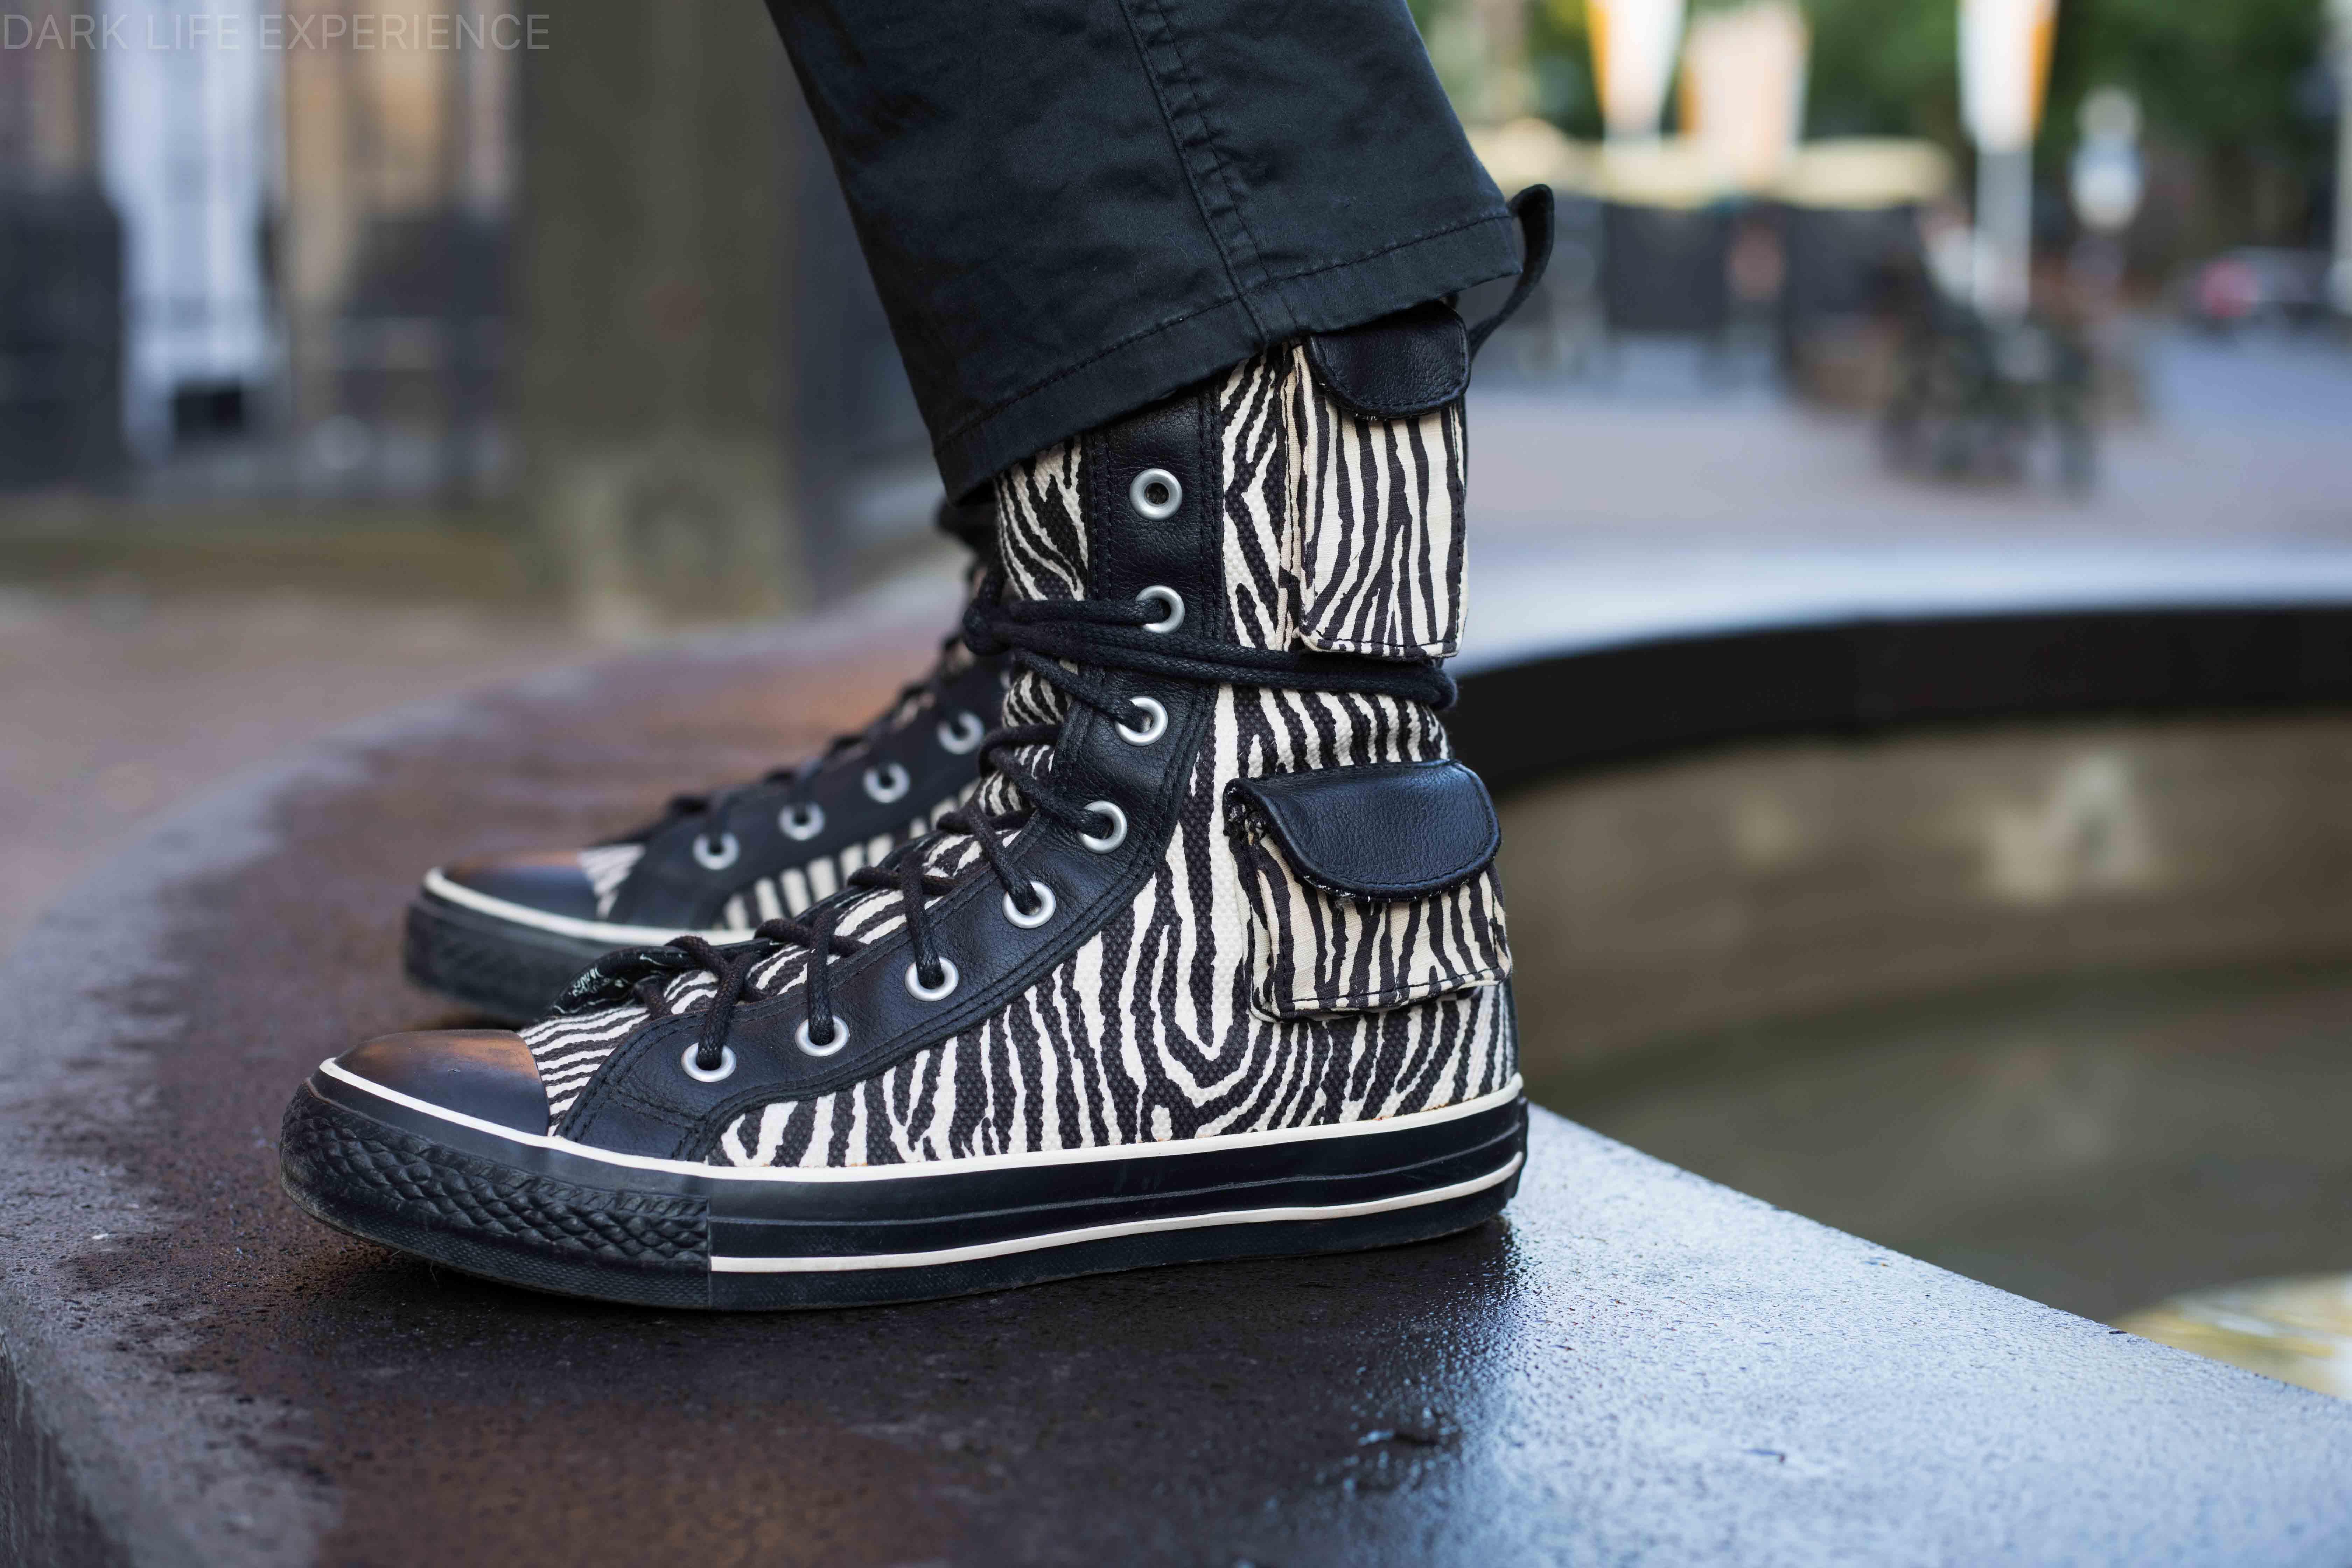 Converse All Star Combat Boots Zebra